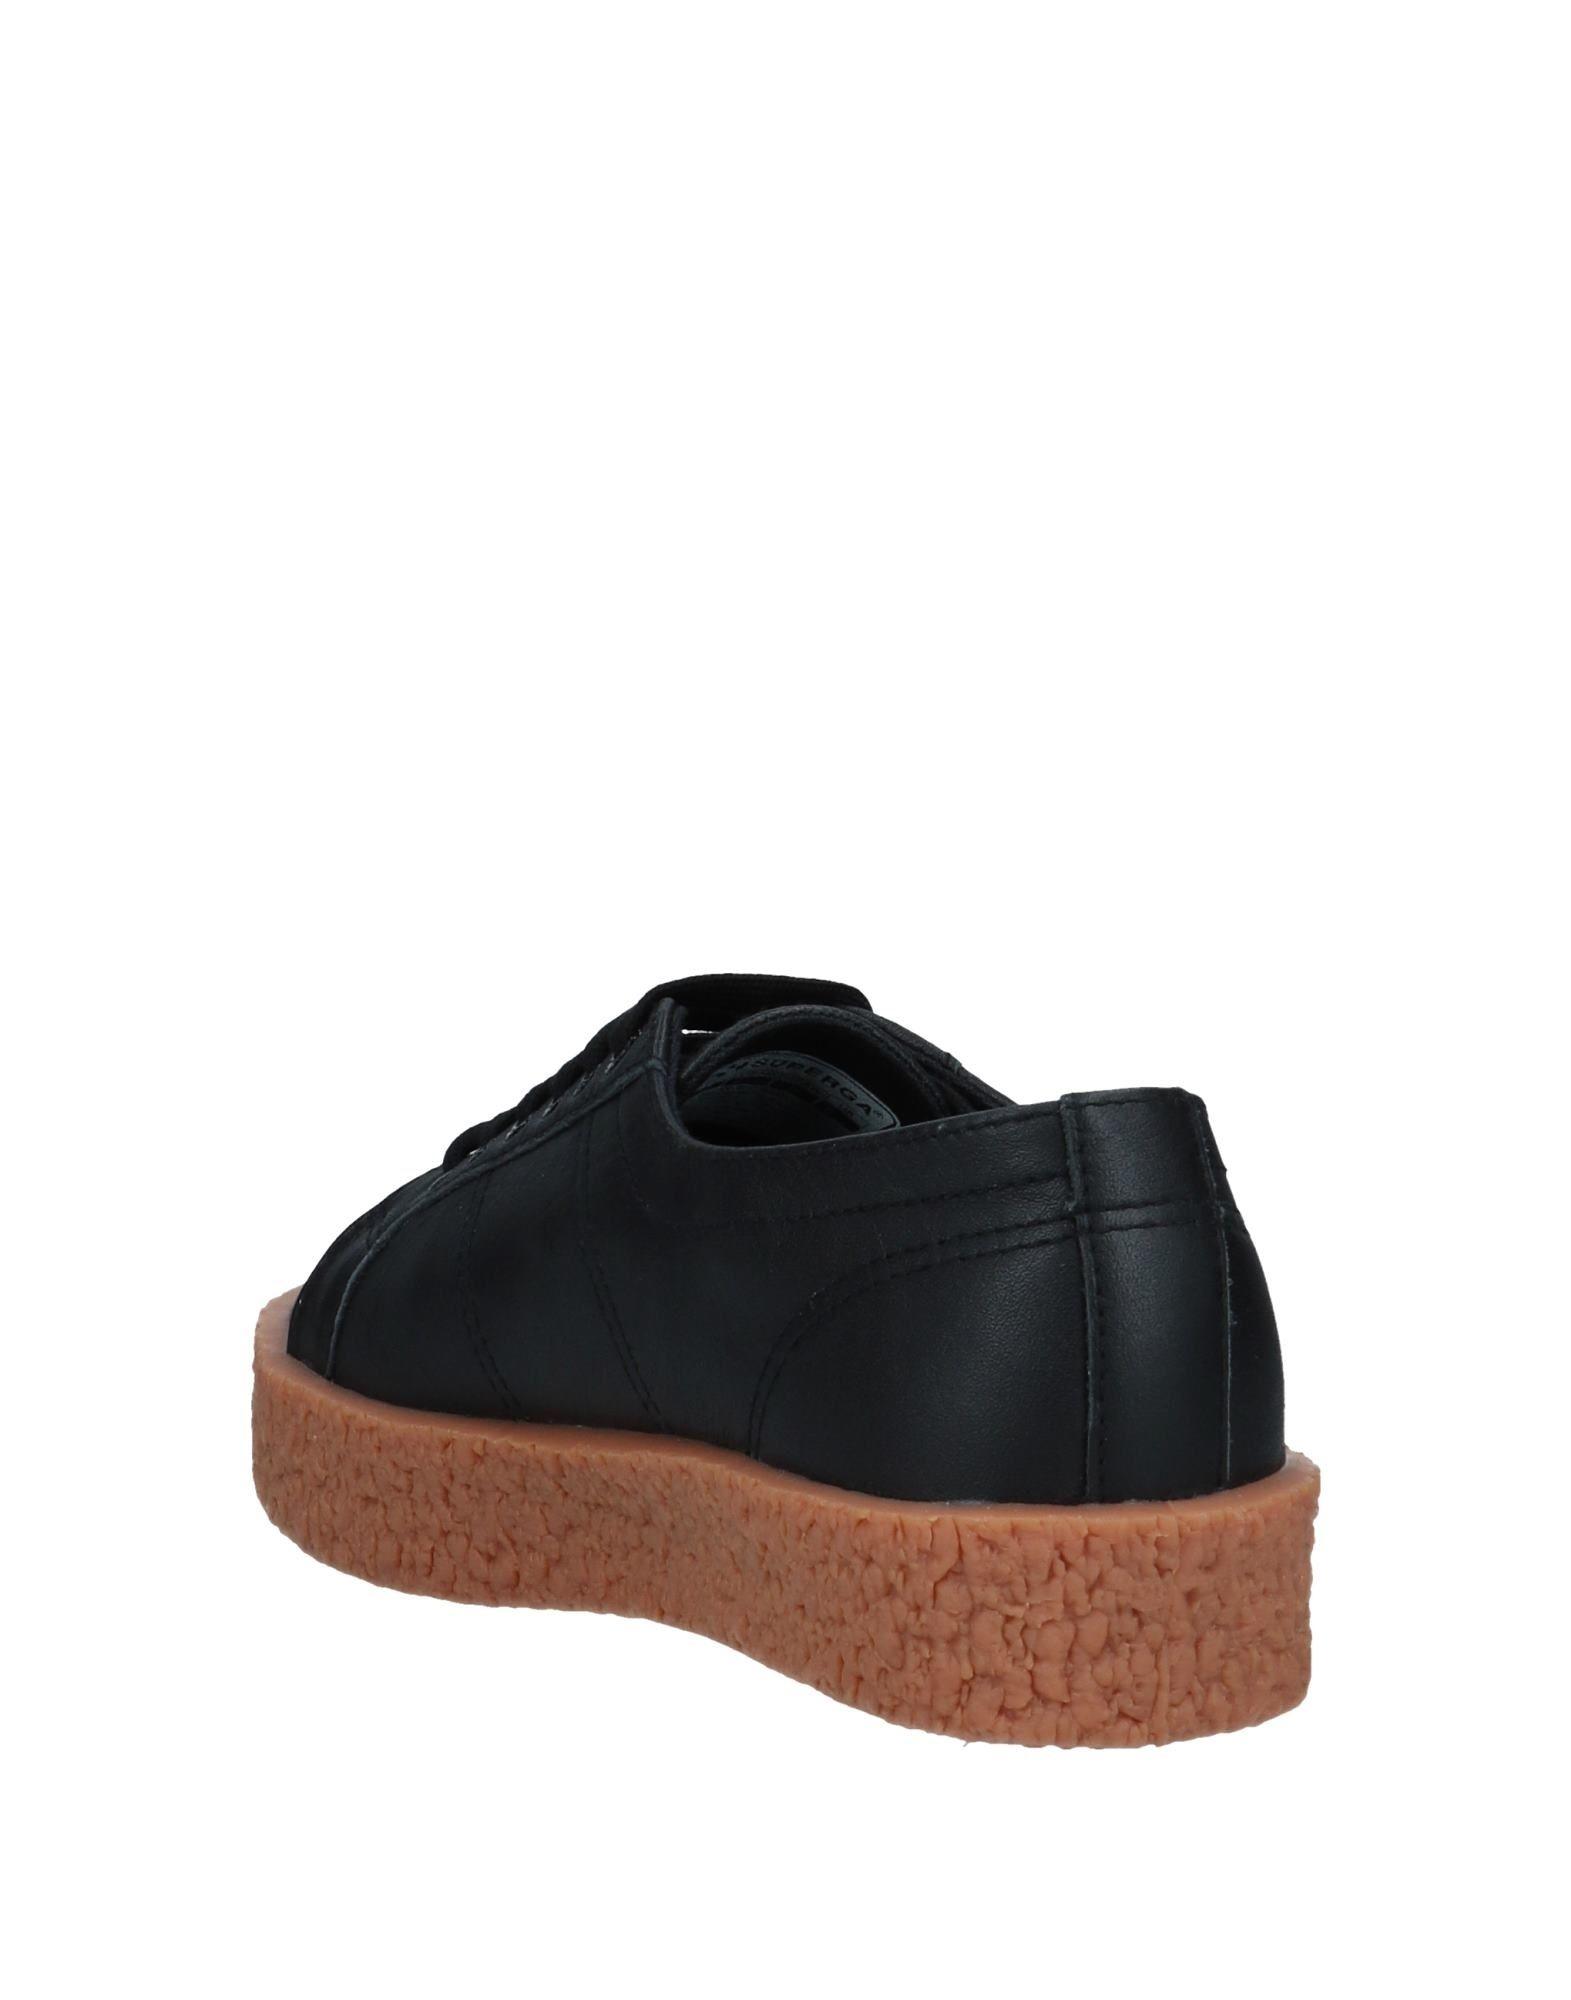 Superga® Sneakers Qualität Damen  11548417XJ Gute Qualität Sneakers beliebte Schuhe 68b61c